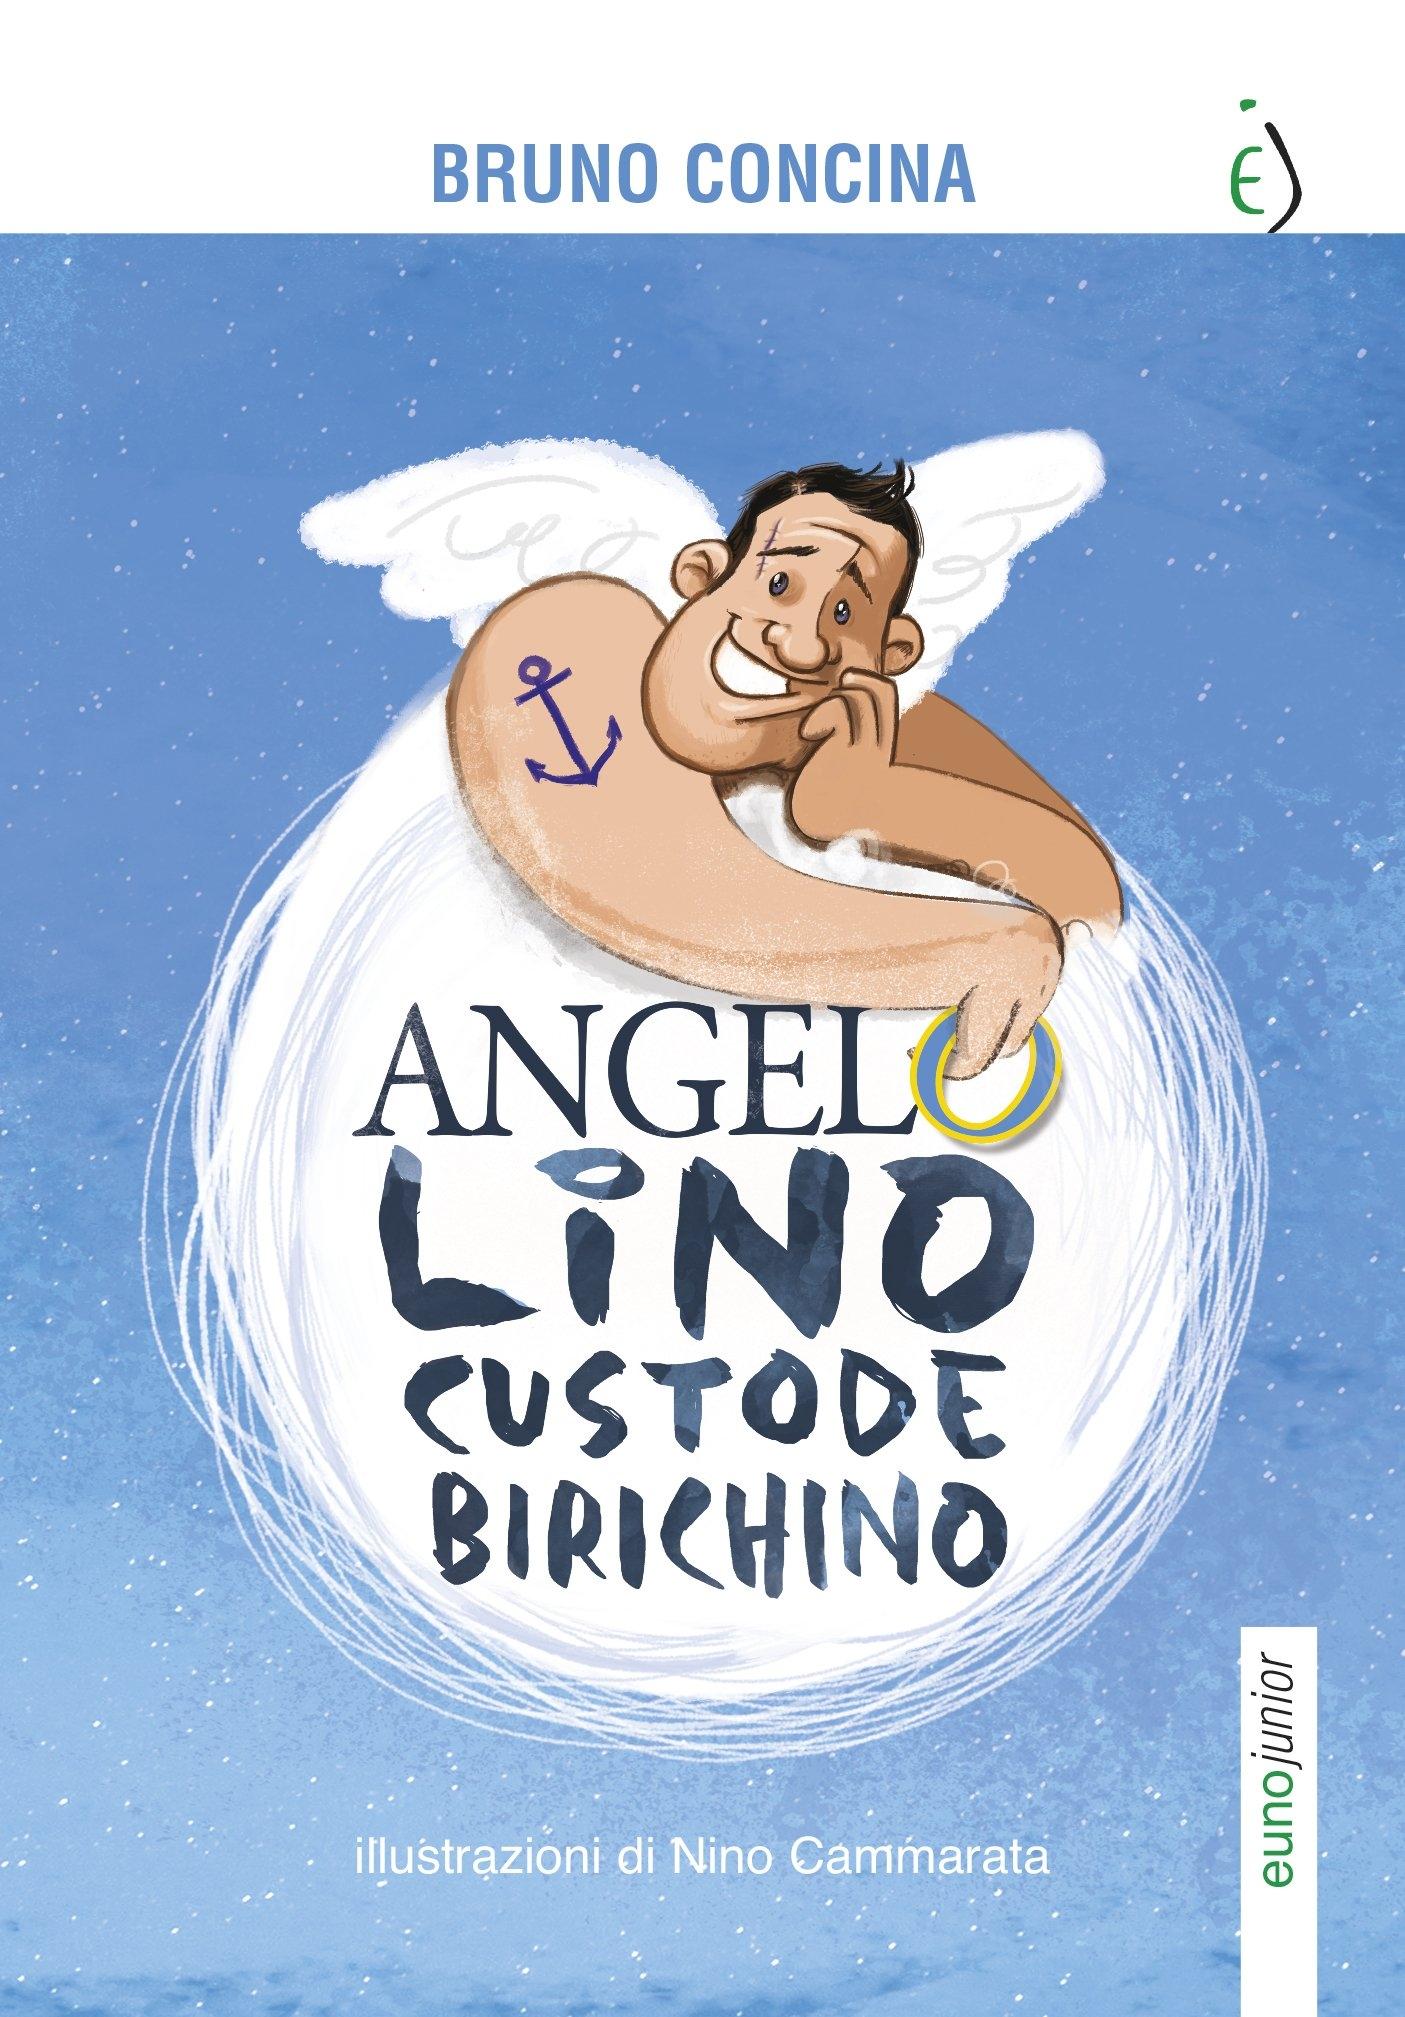 Angelo Lino custode birichino